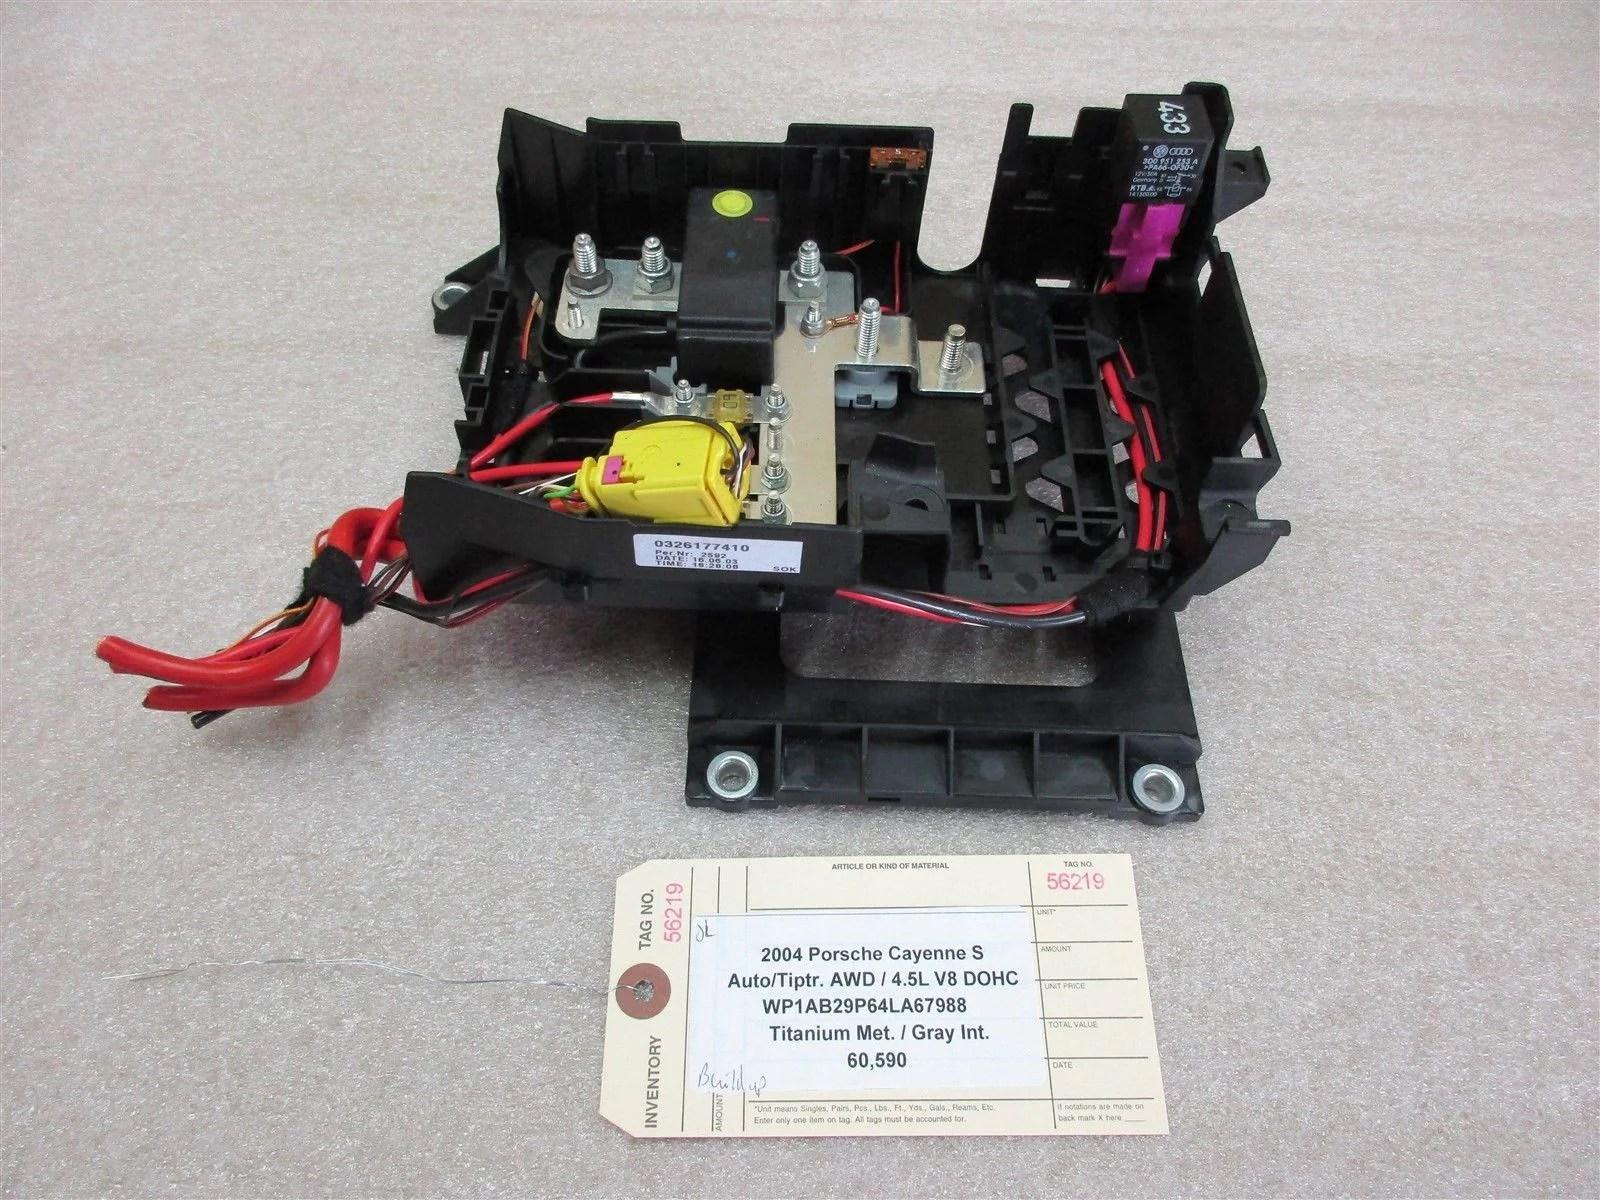 hight resolution of 04 cayenne s awd porsche 955 seat fuse box relay 7l0937548 2012 jaguar xj fuse box 2004 porsche cayenne fuse box